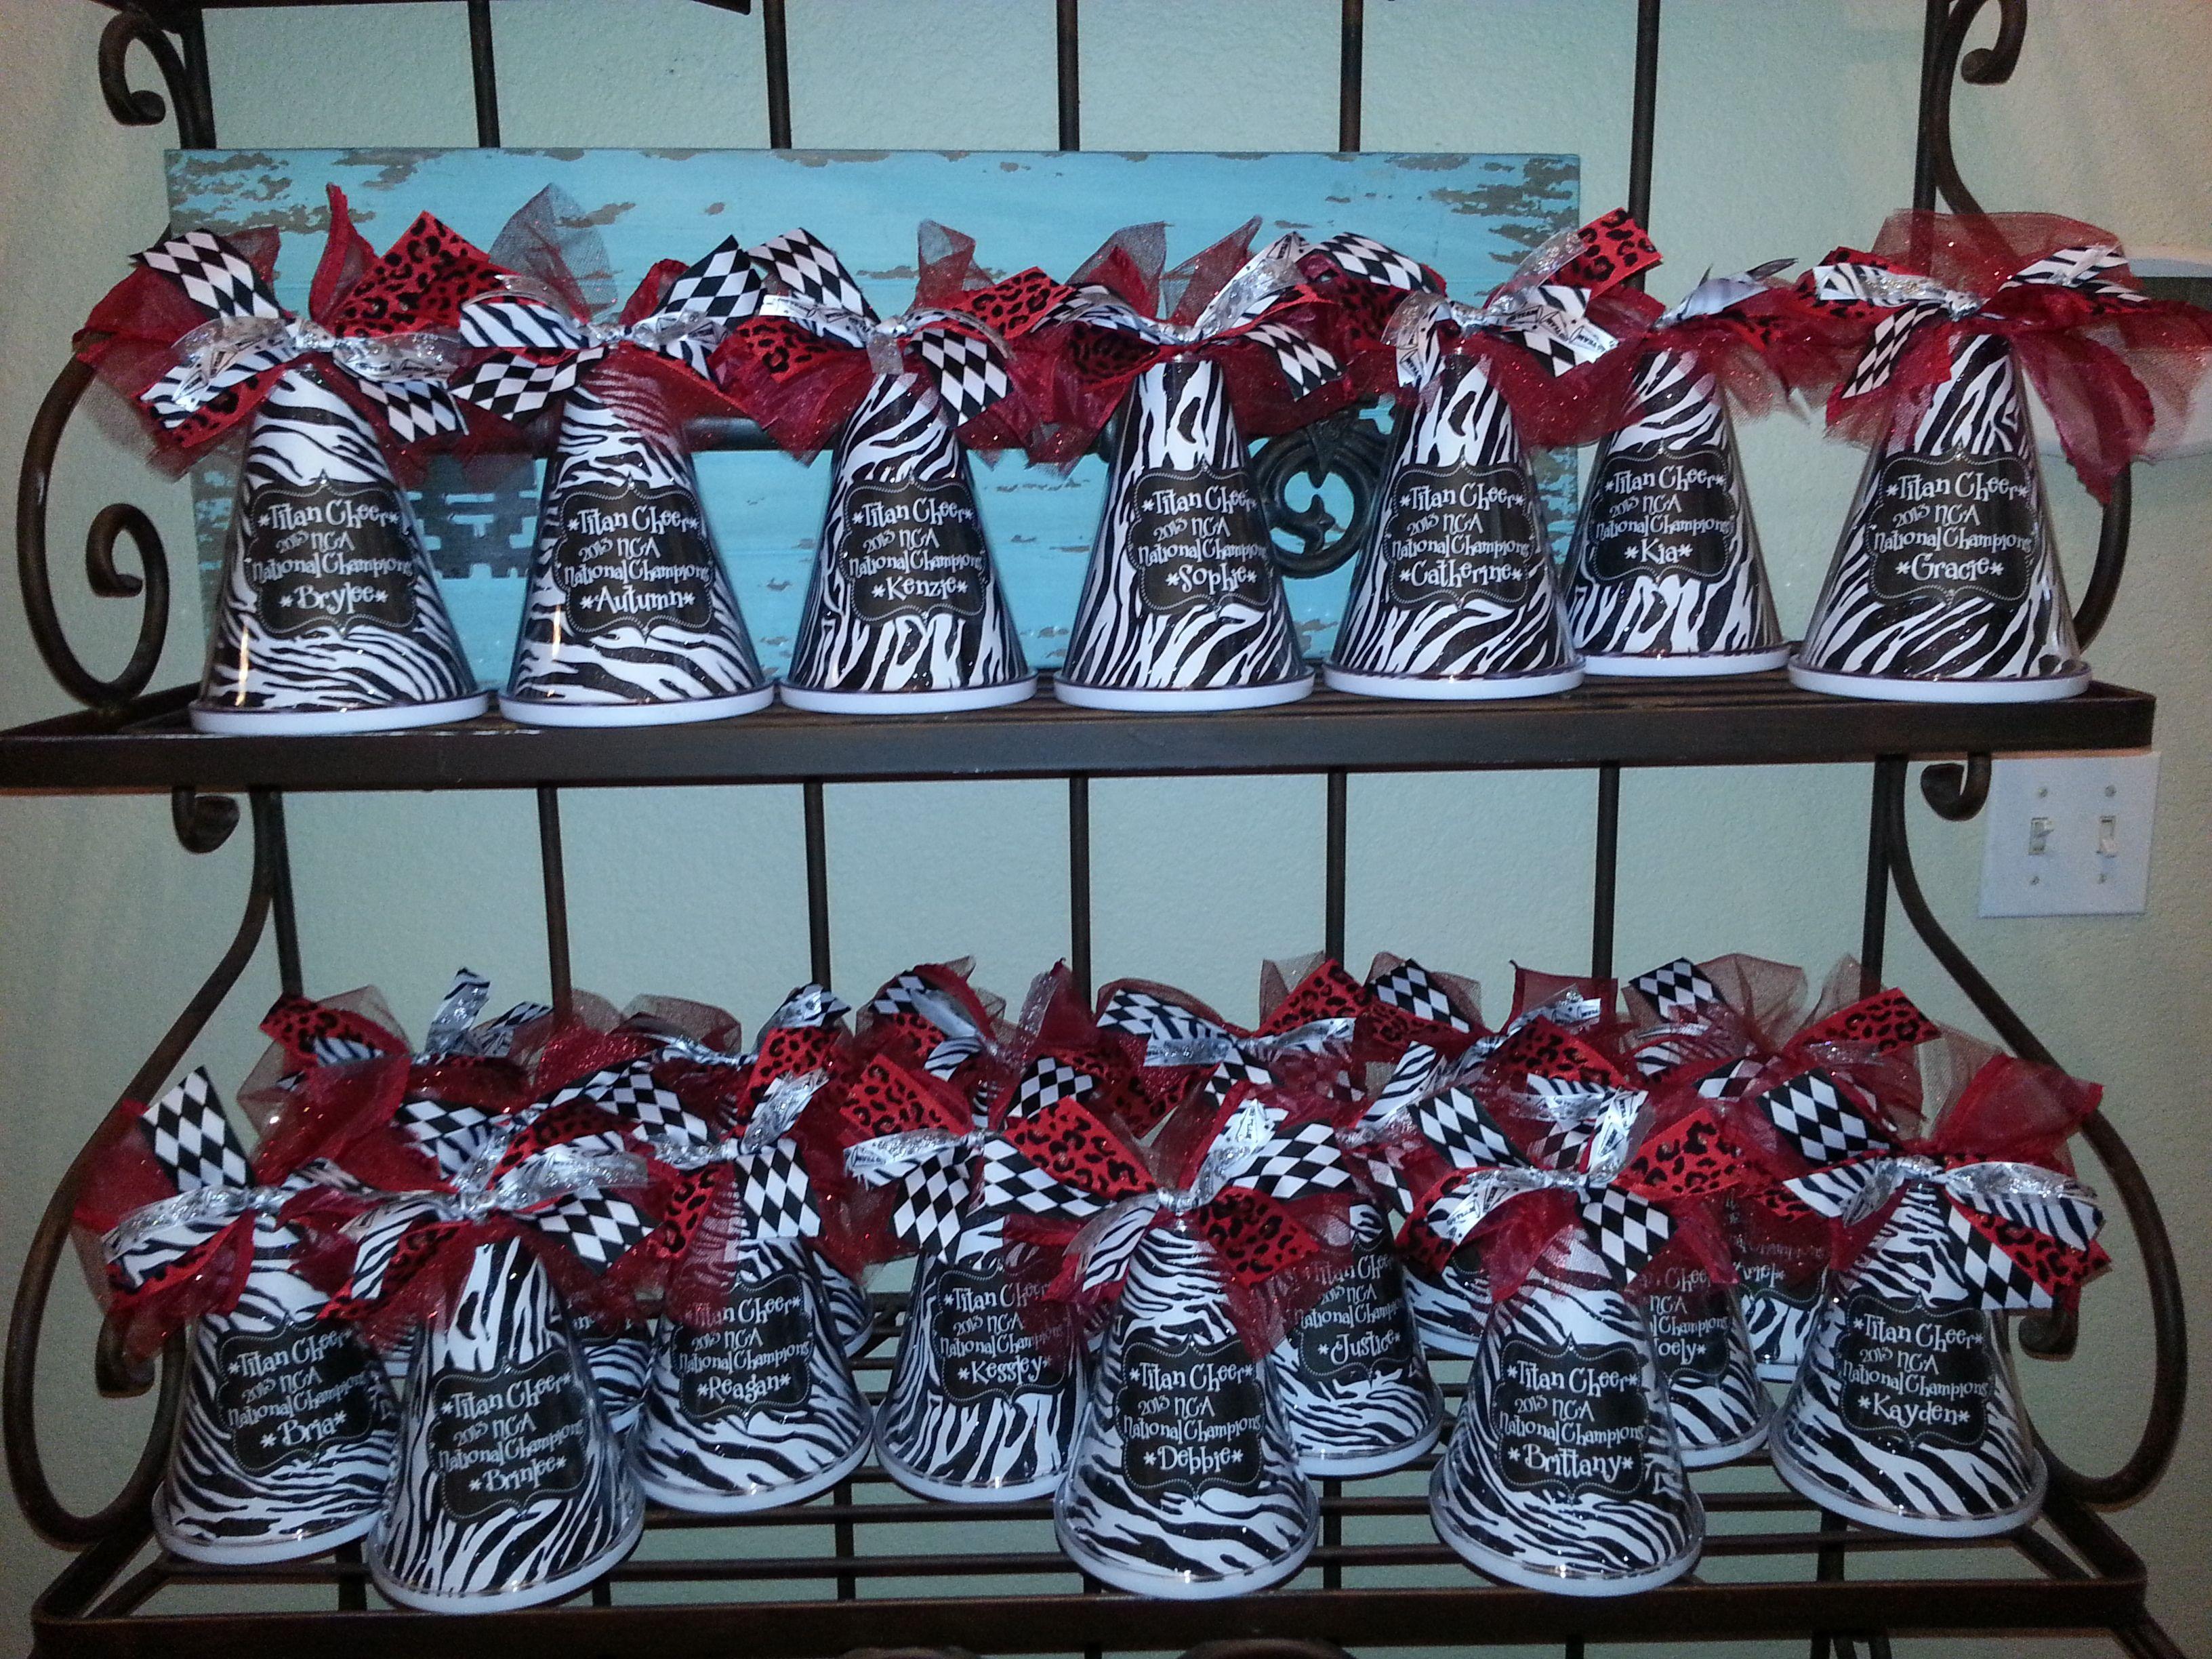 Lots of cheer megaphones for banquet cheerleading for Cheerleading decorations